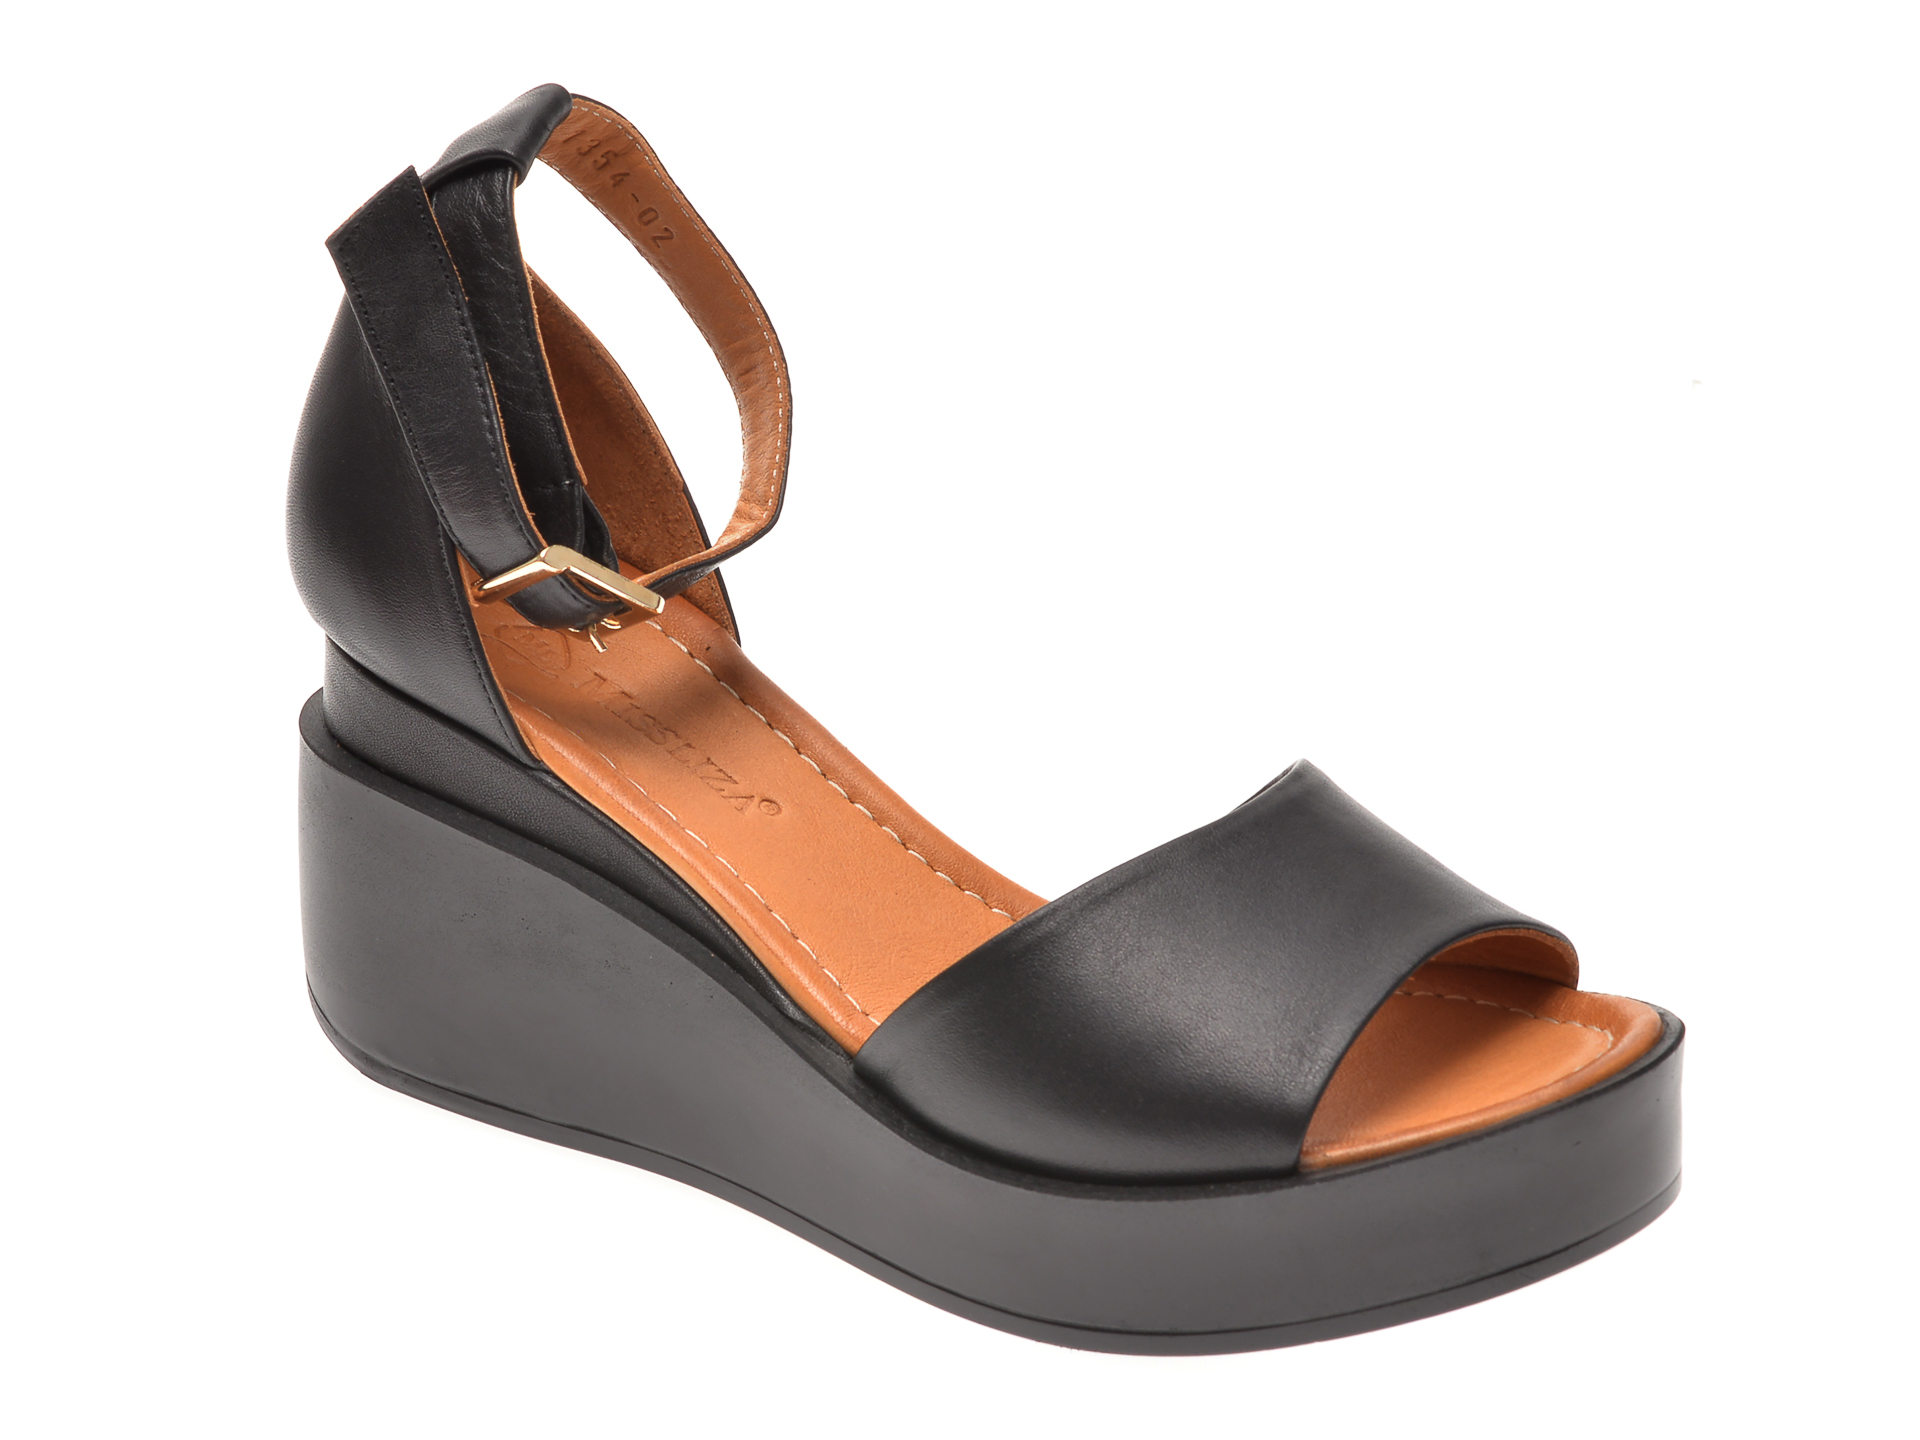 Sandale MISS LIZA negre, 1181354, din piele naturala